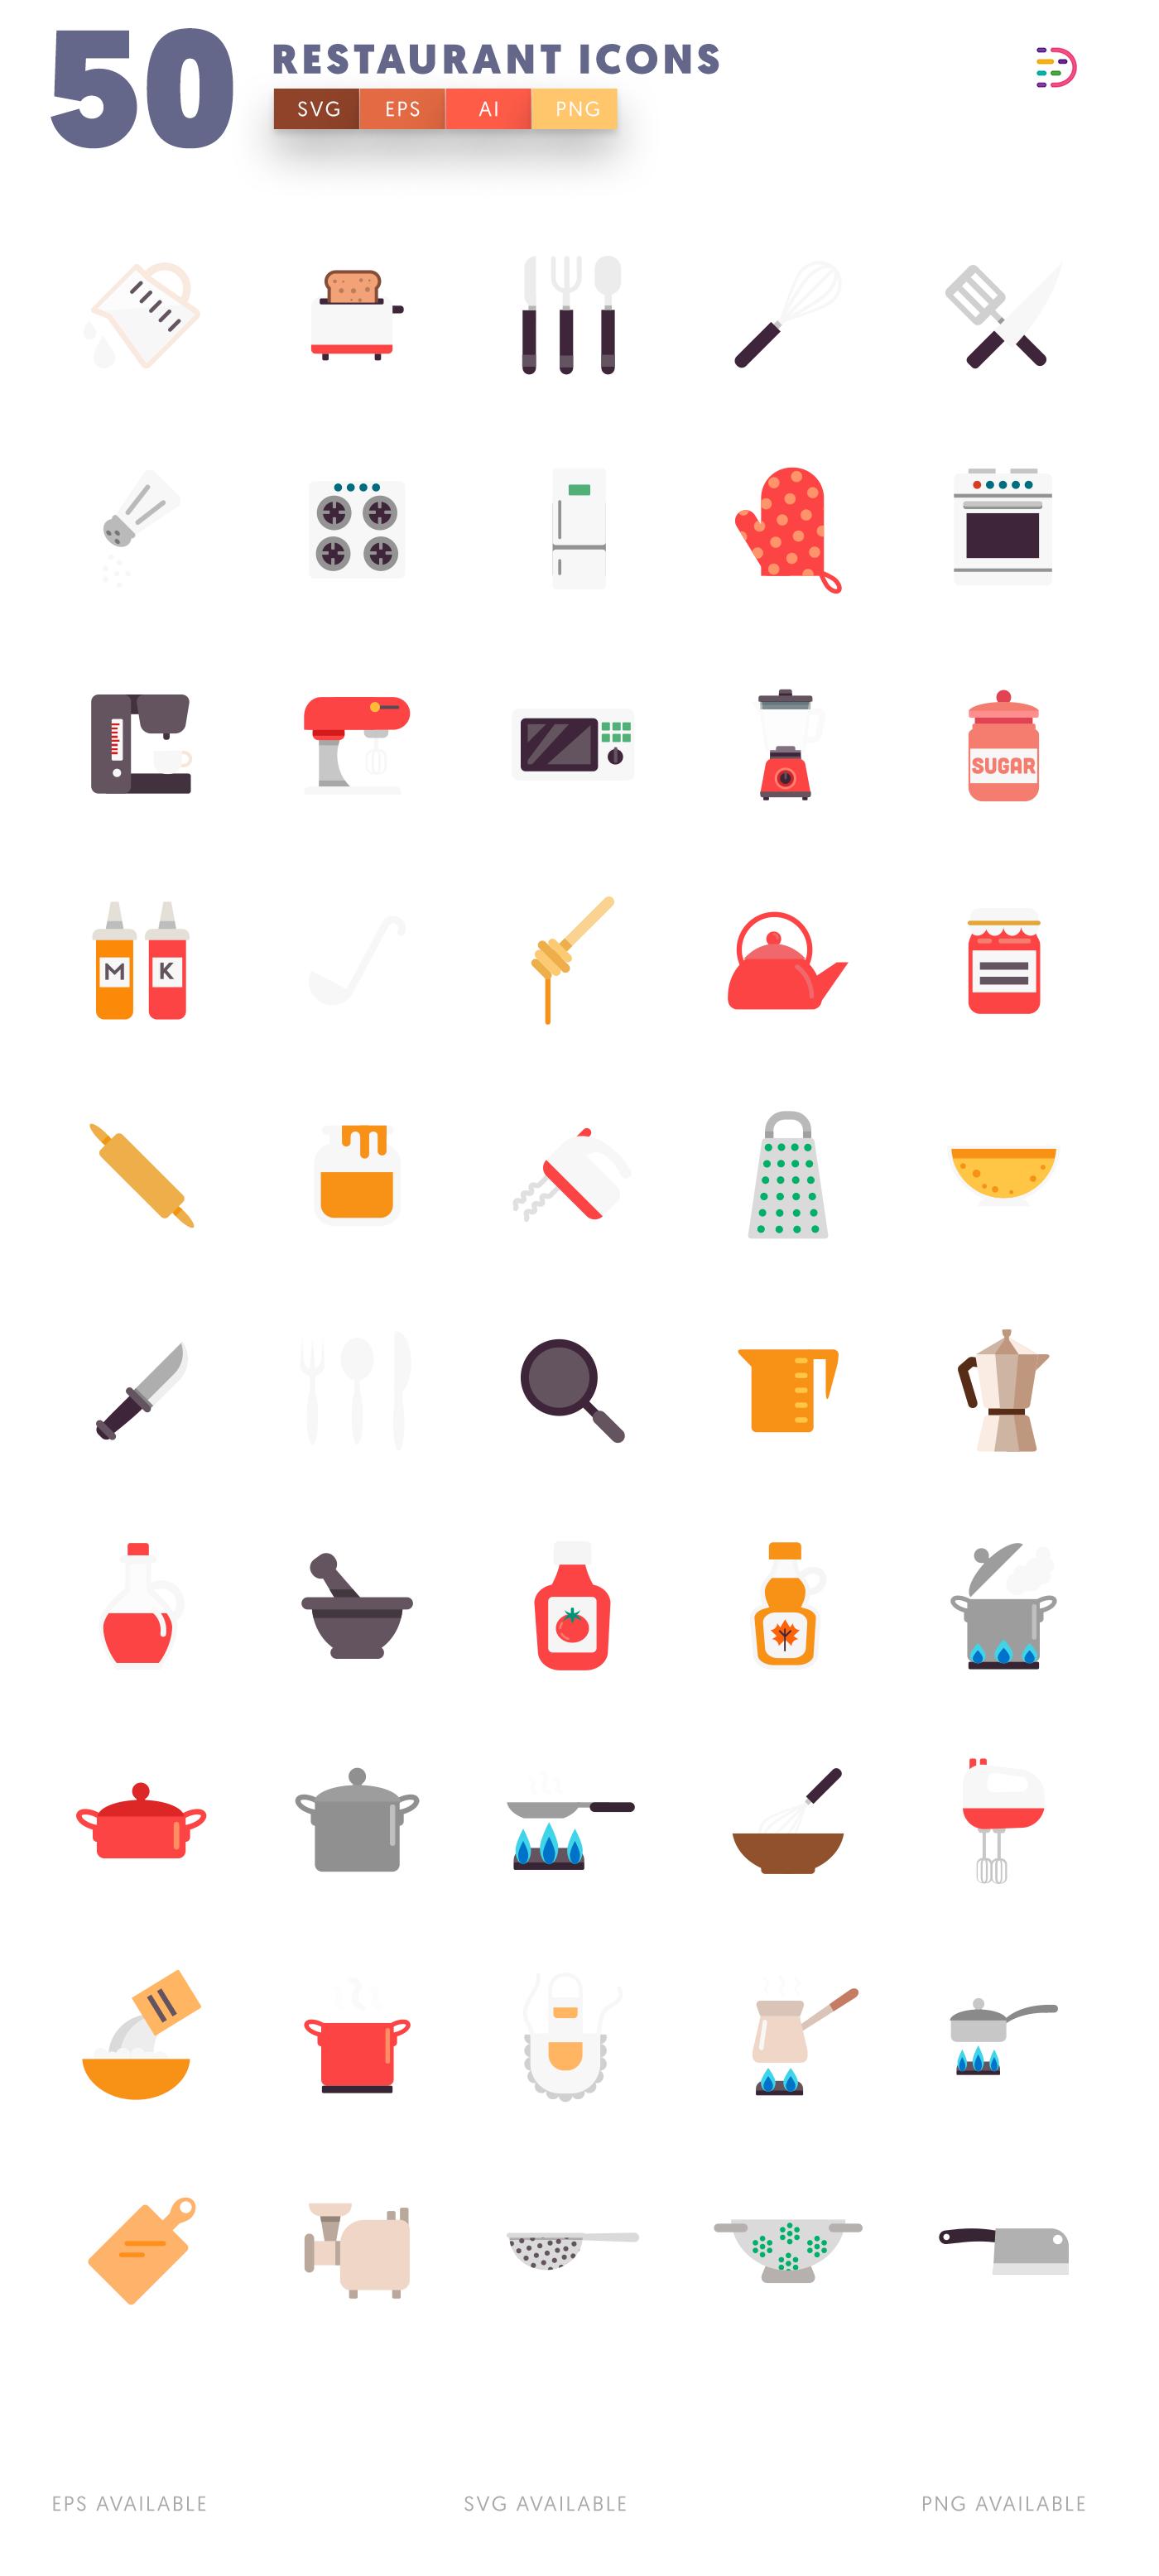 White background 50 Restaurant Icons